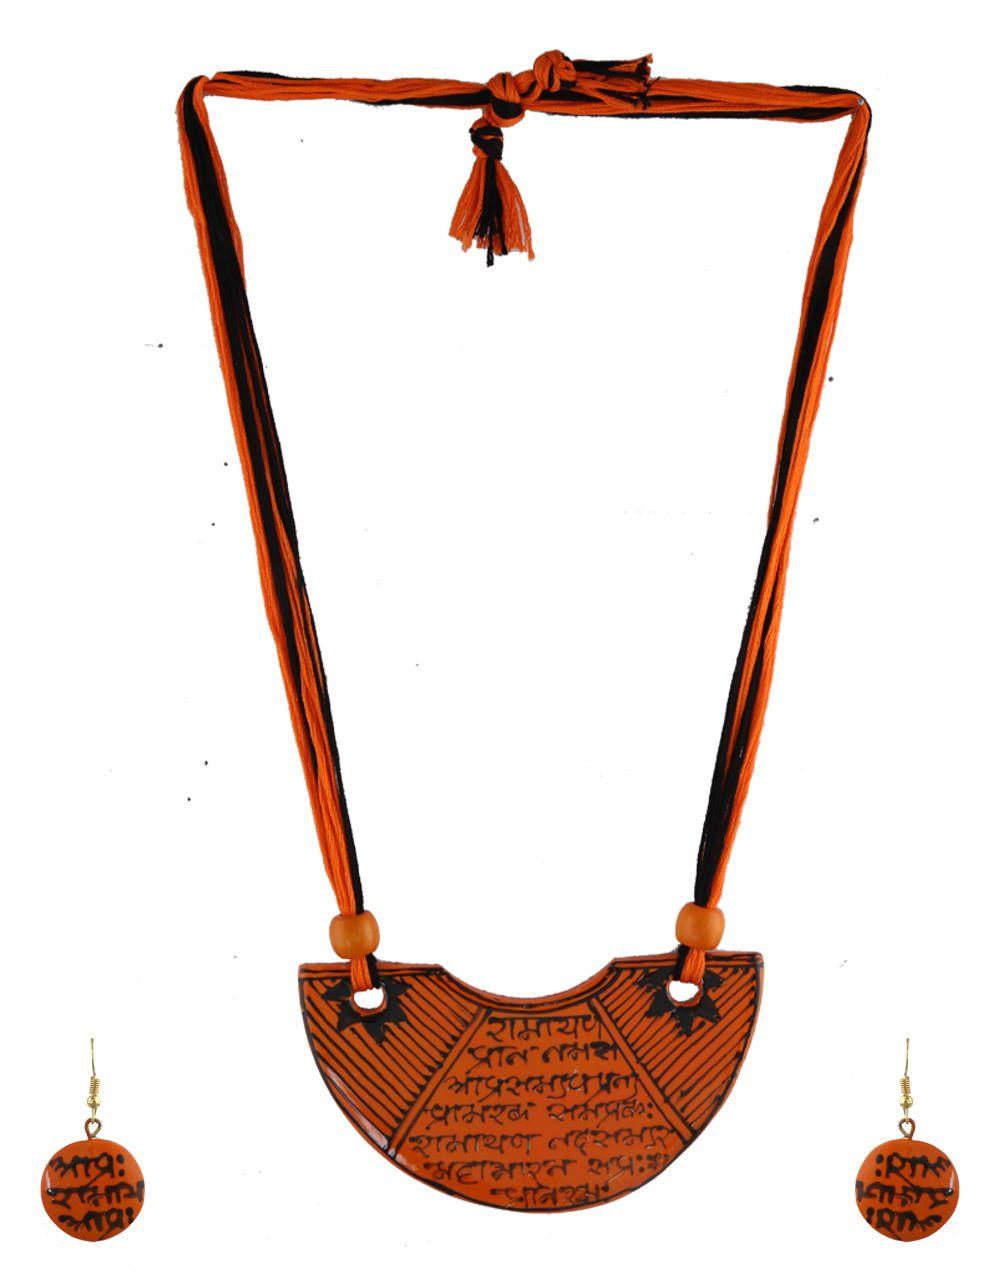 Anuradha Art Orange Colour Very Classy Wonderful Sanskrit Shlok Print On Pendant Terracotta Thread Necklace Set For Women/Girls